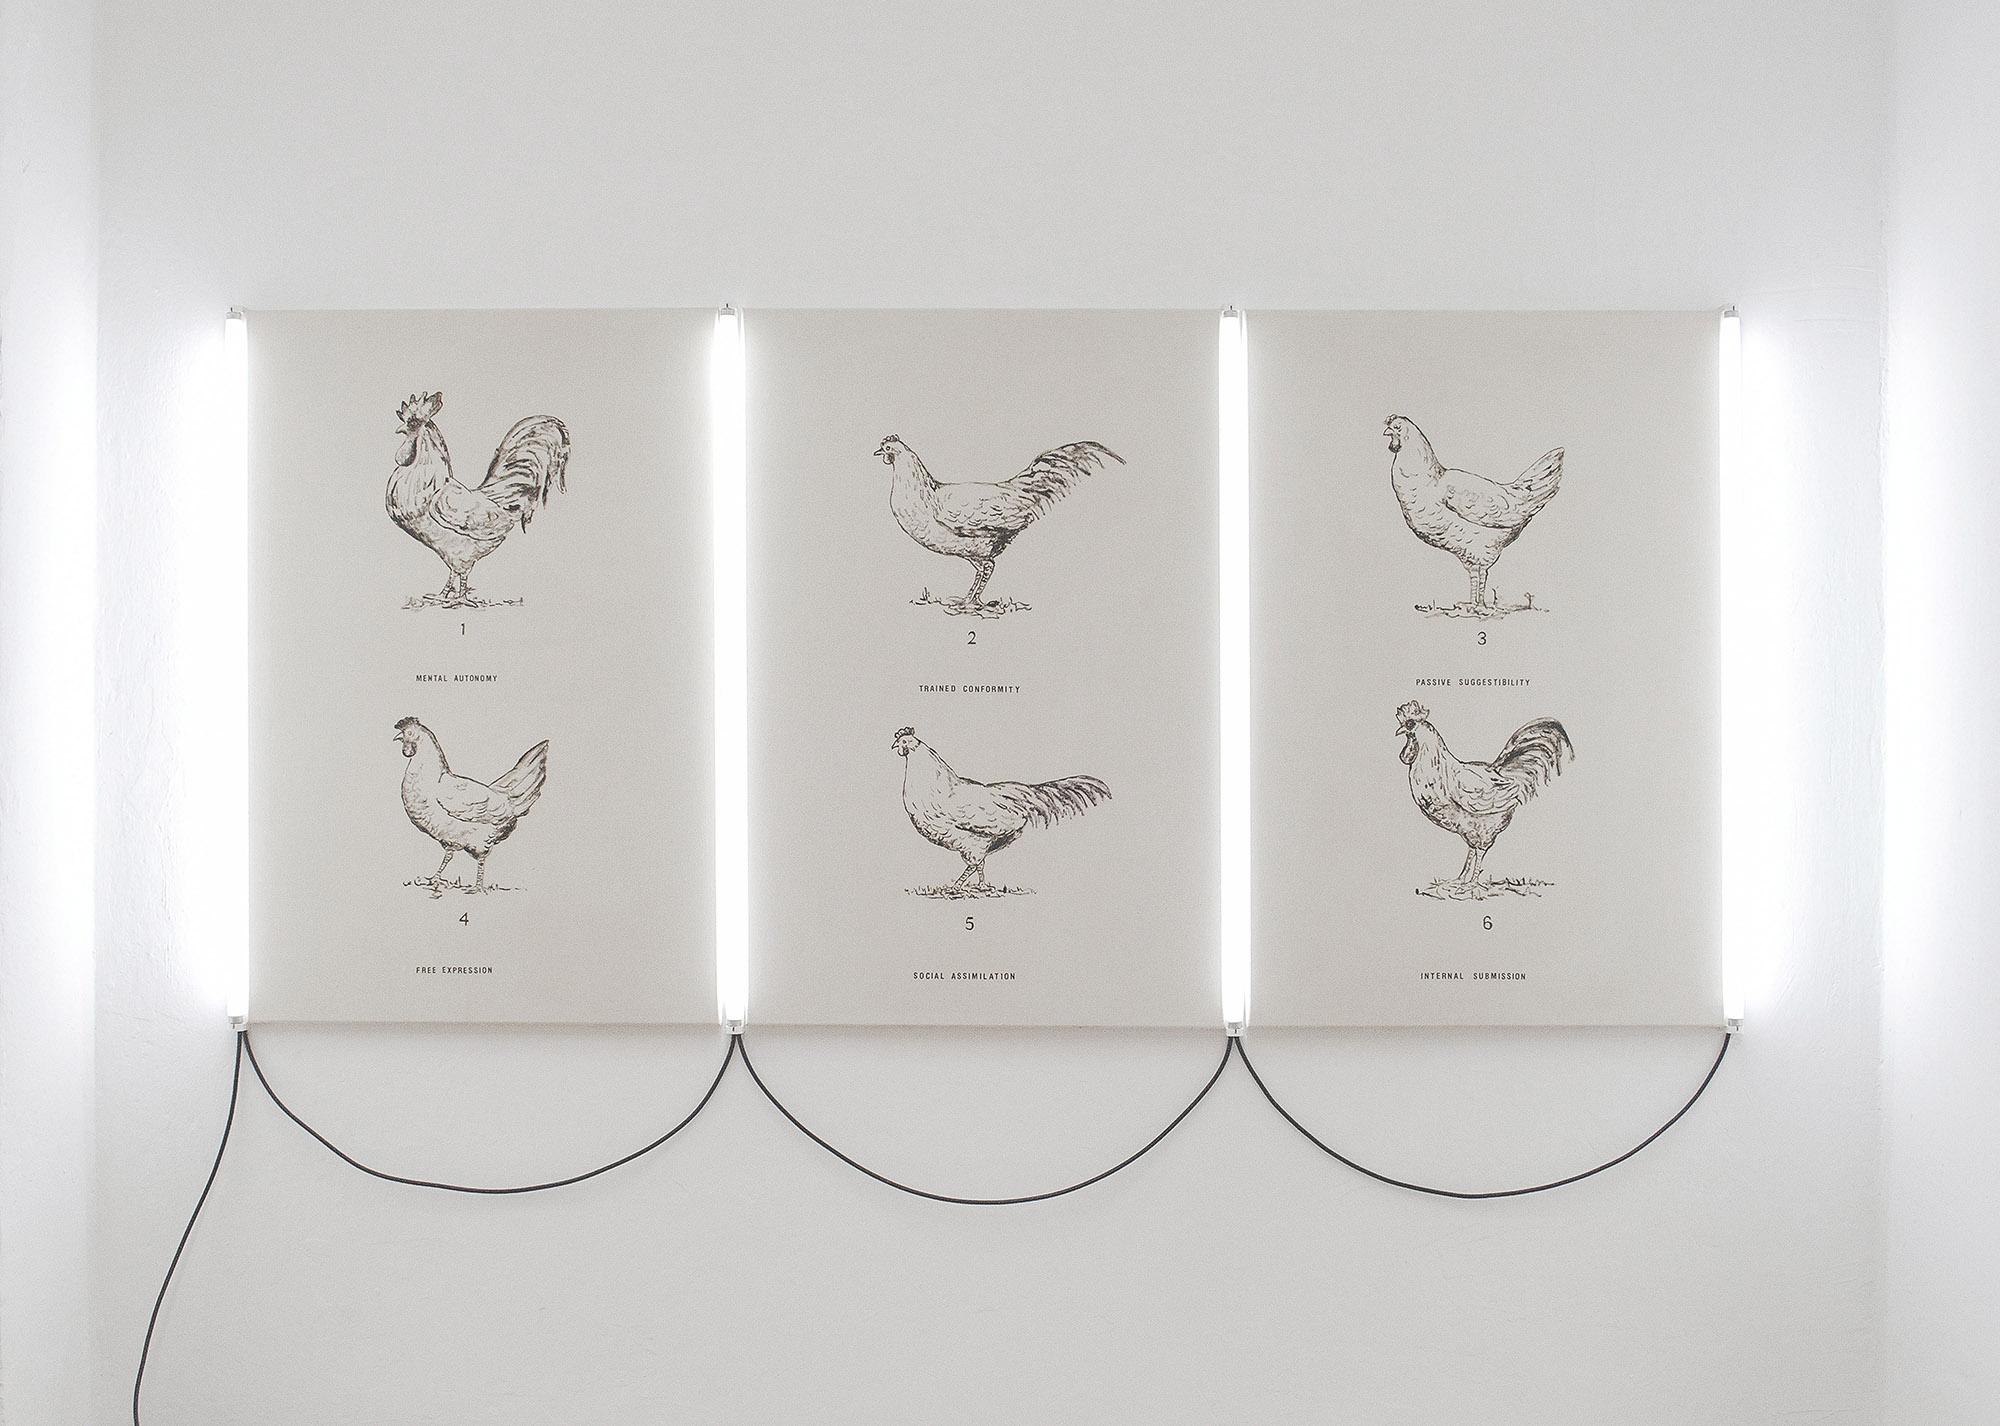 Marcus Kleinfeld, SOCIAL FORMATION, 2011 Oil on canvas, 4 UV tubes 152 x 256 cm (Triptych)